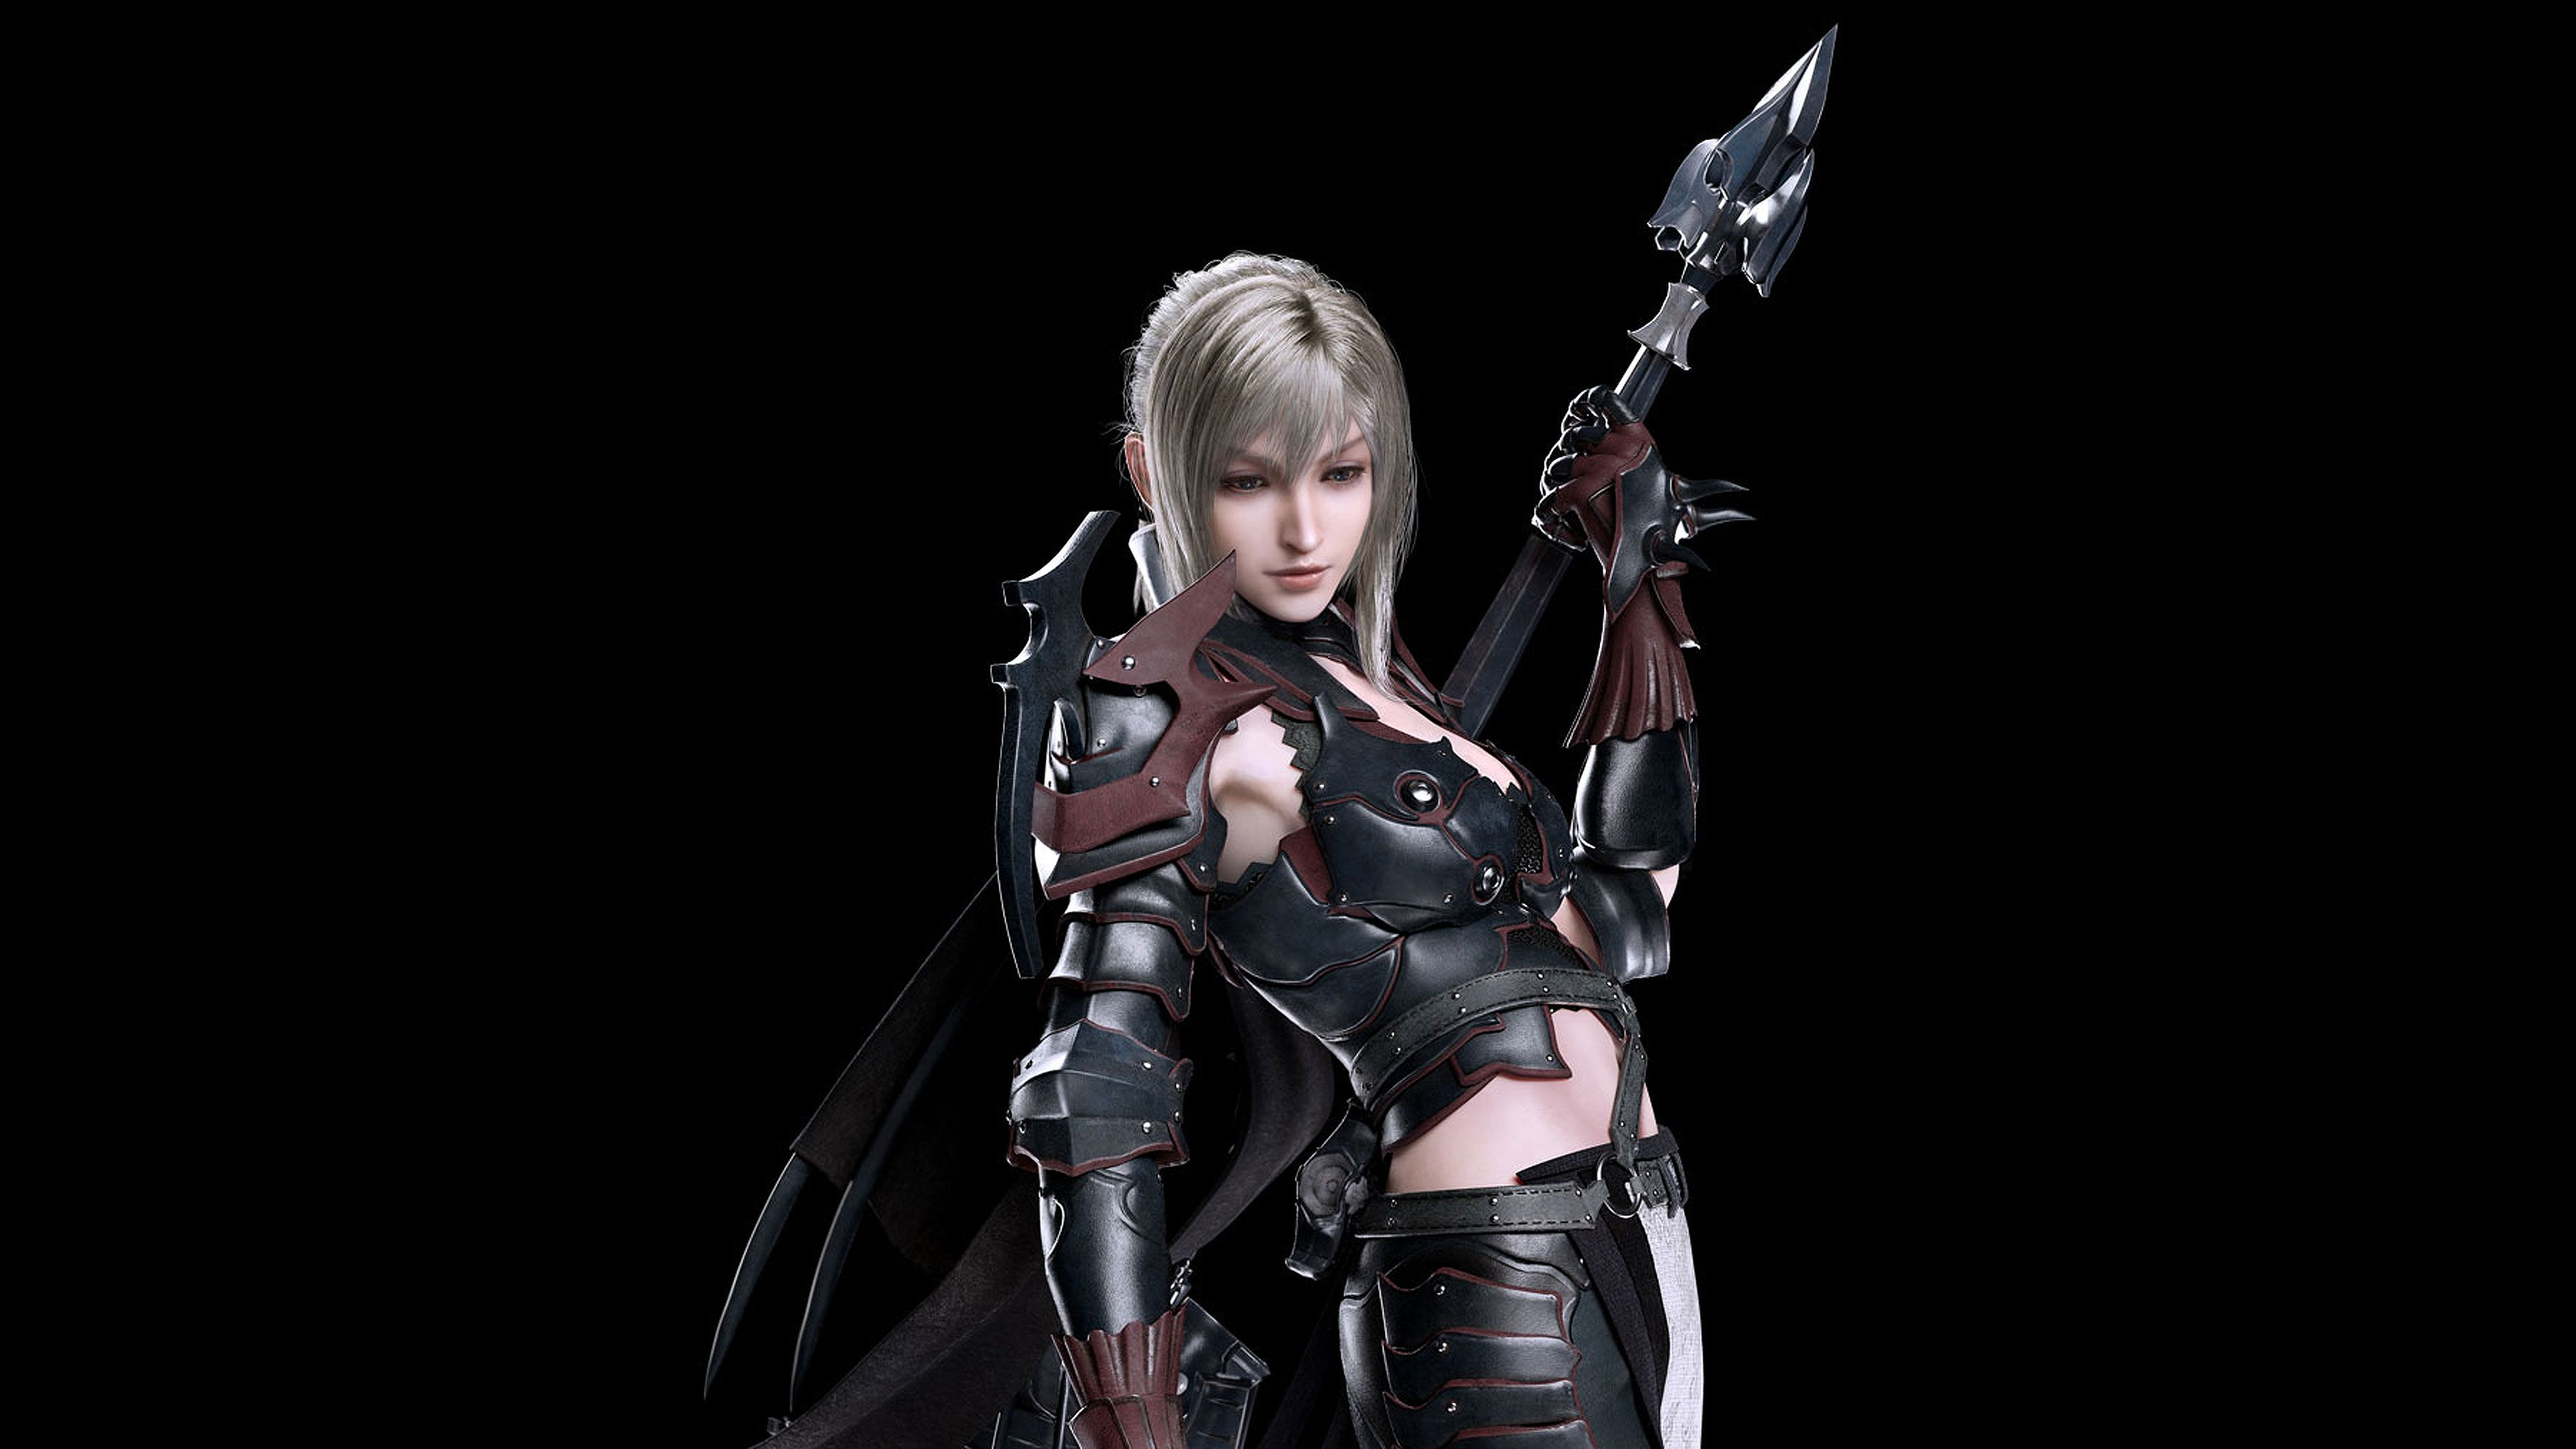 Aranea Highwind Final Fantasy Xv Hd Games 4k Wallpapers: Top Wallpaper Engine Final Fantasy Xv